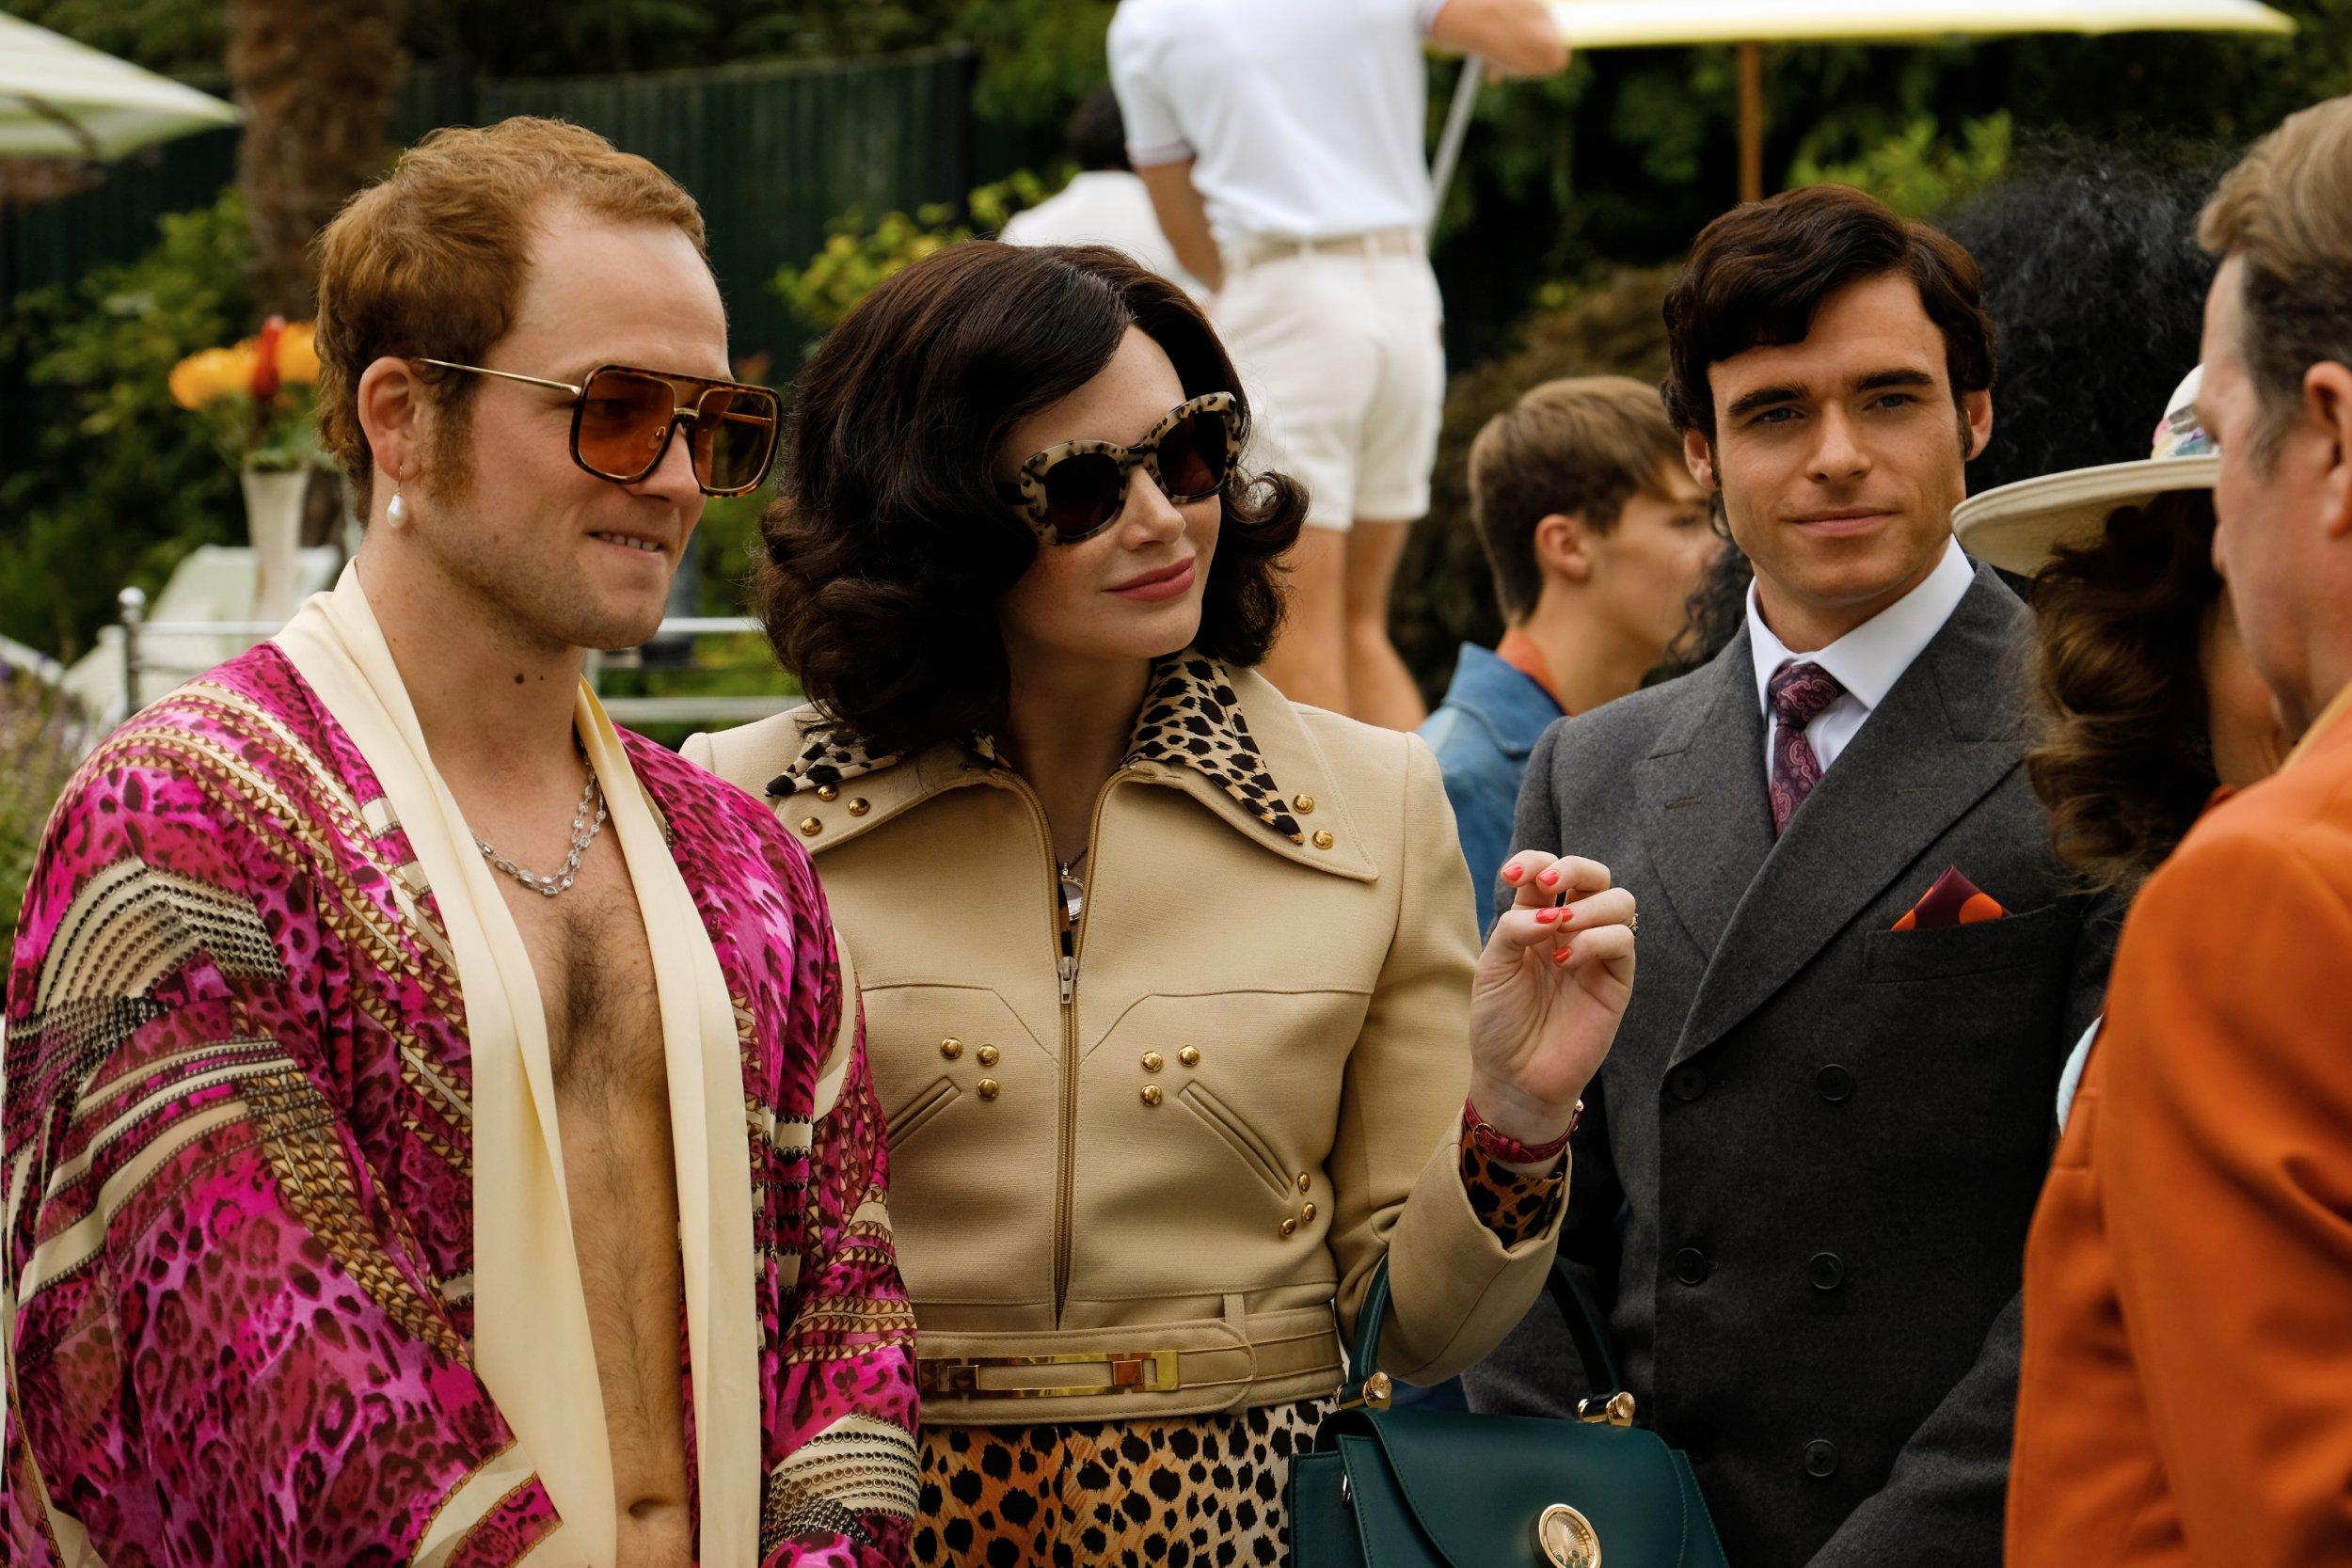 Rocketman star Bryce Dallas Howard admits playing Elton John's mum was 'daunting'